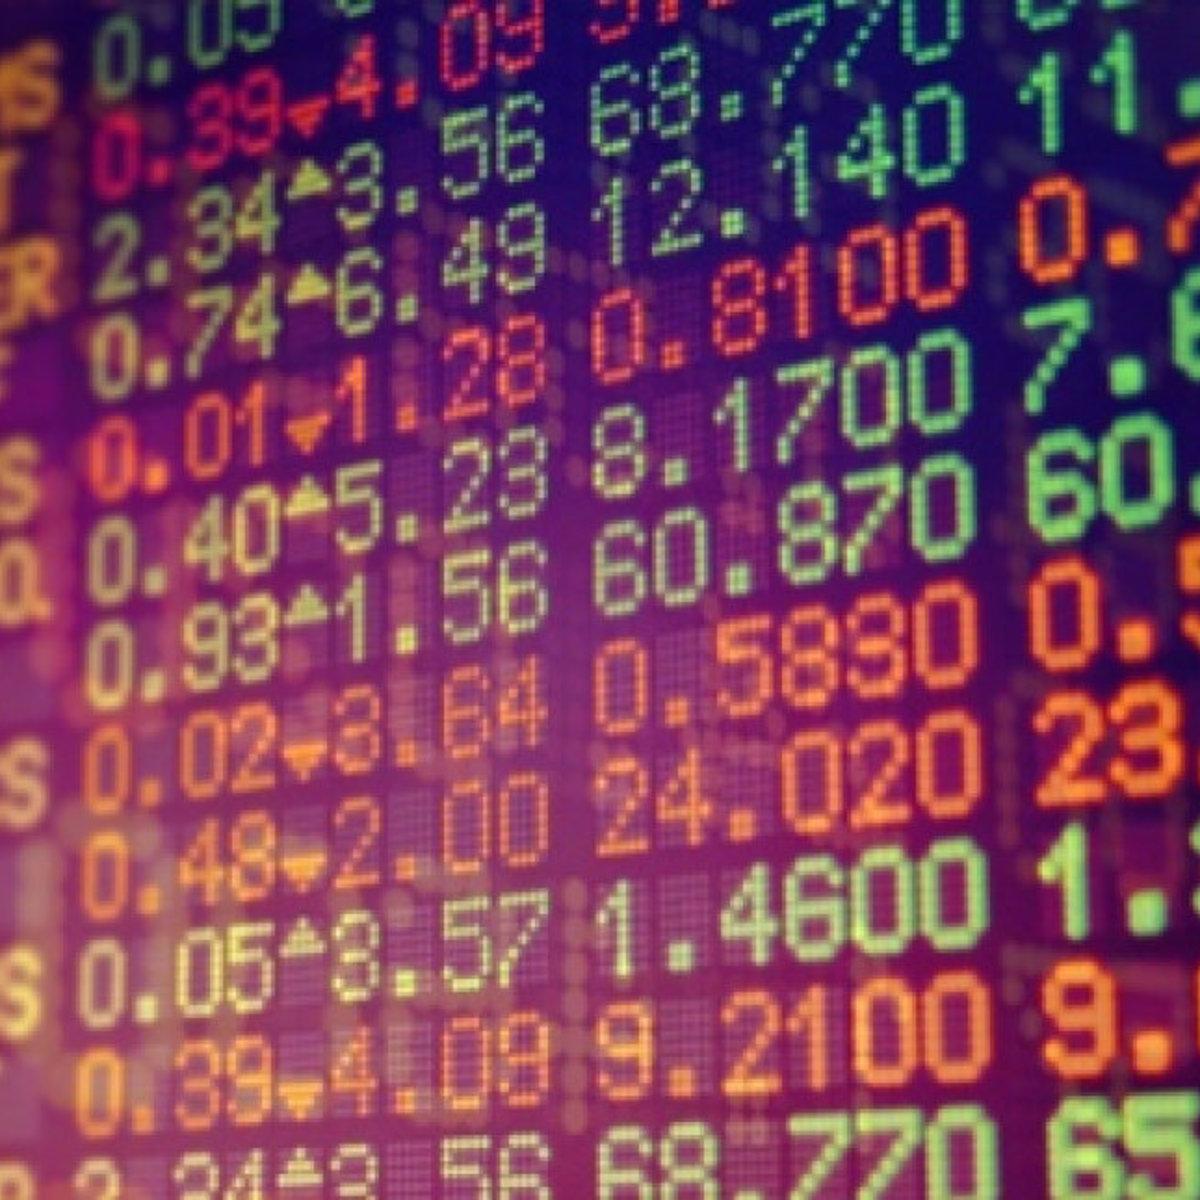 Trading Algorithms course image